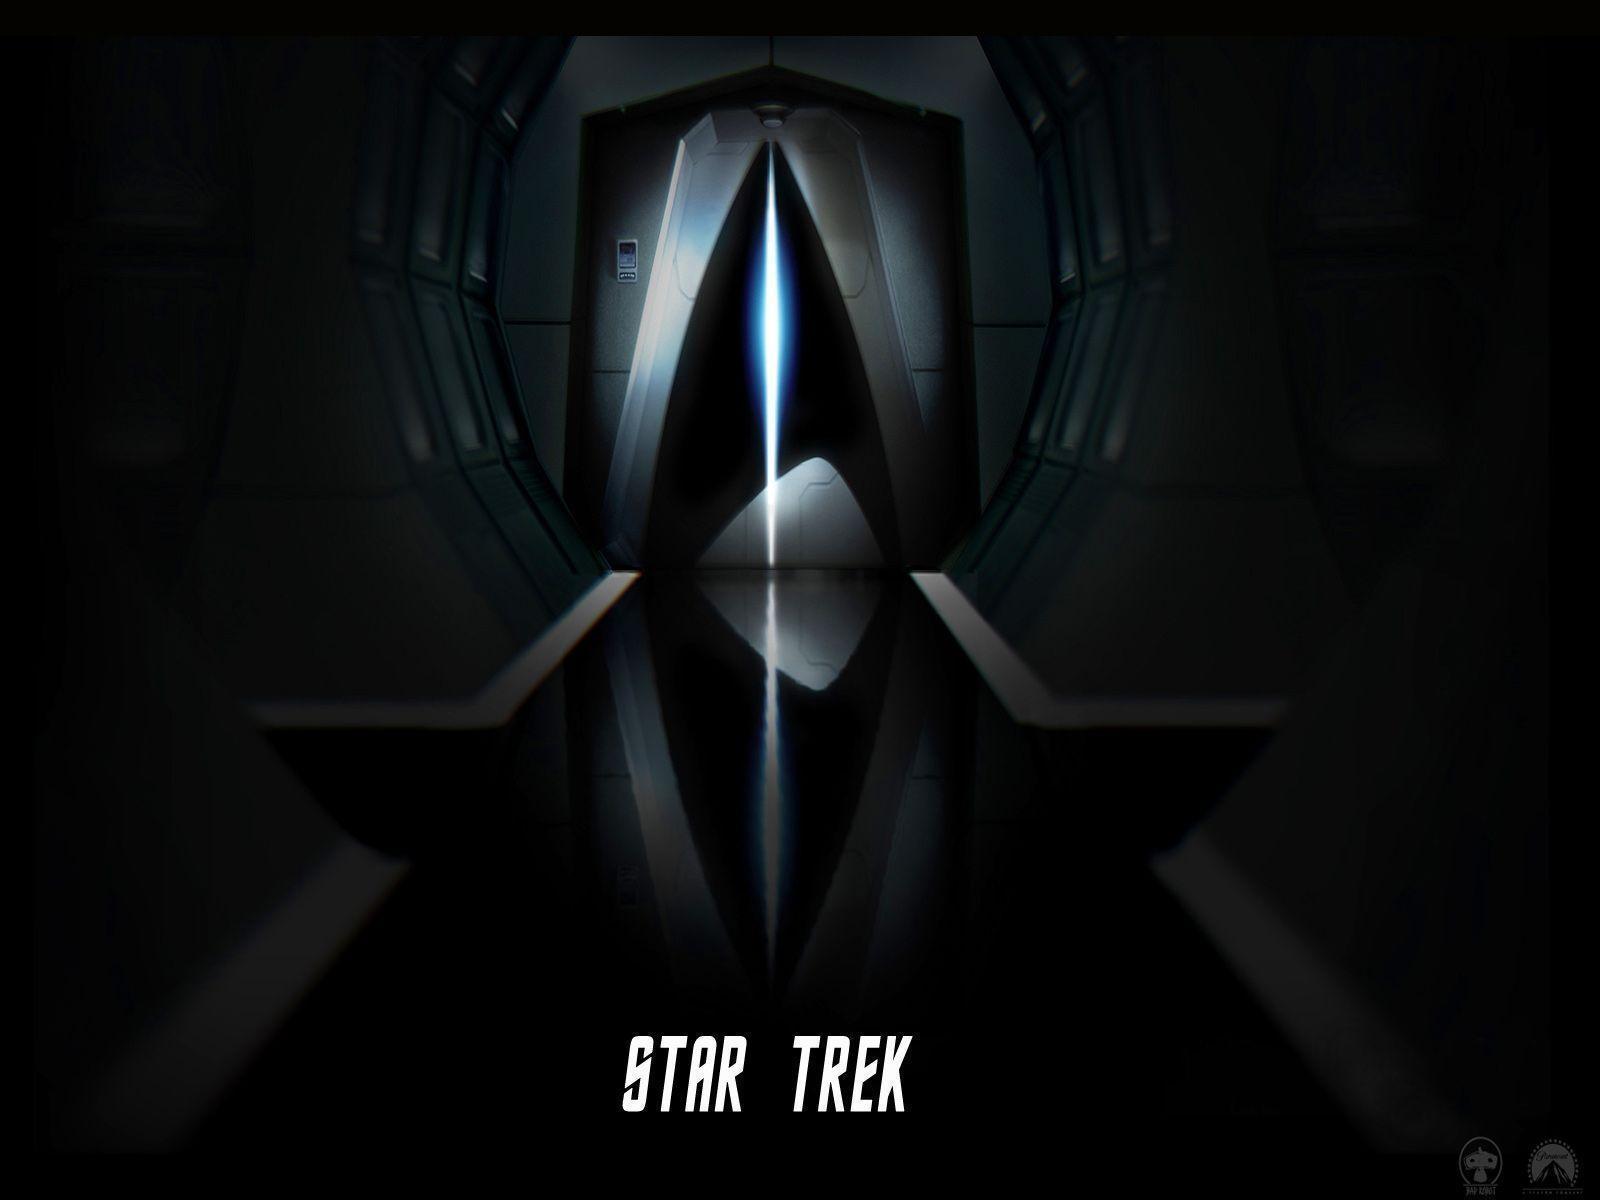 Star trek insignia wallpaper